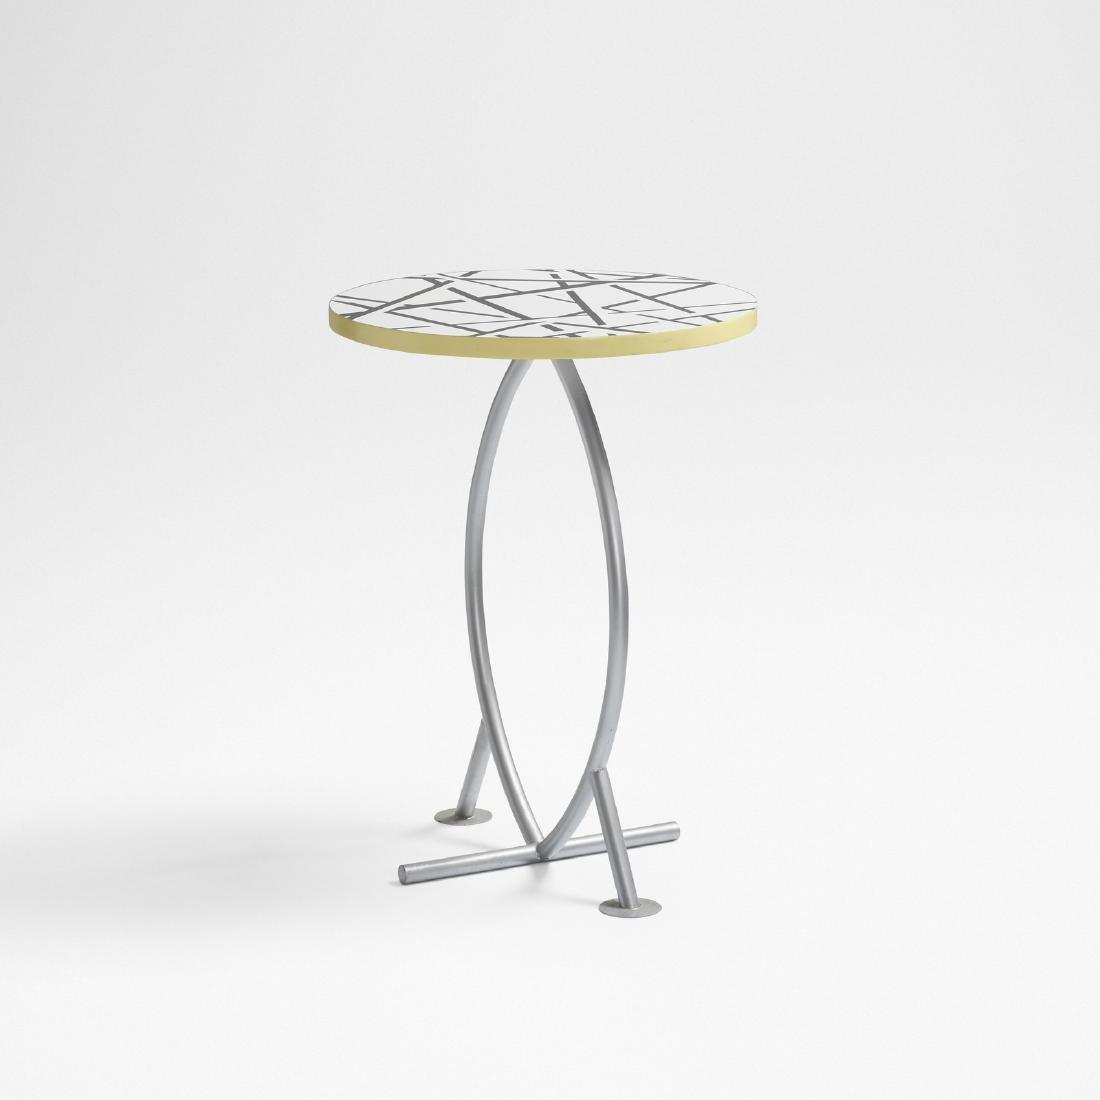 Michele de Lucchi, Cairo occasional table